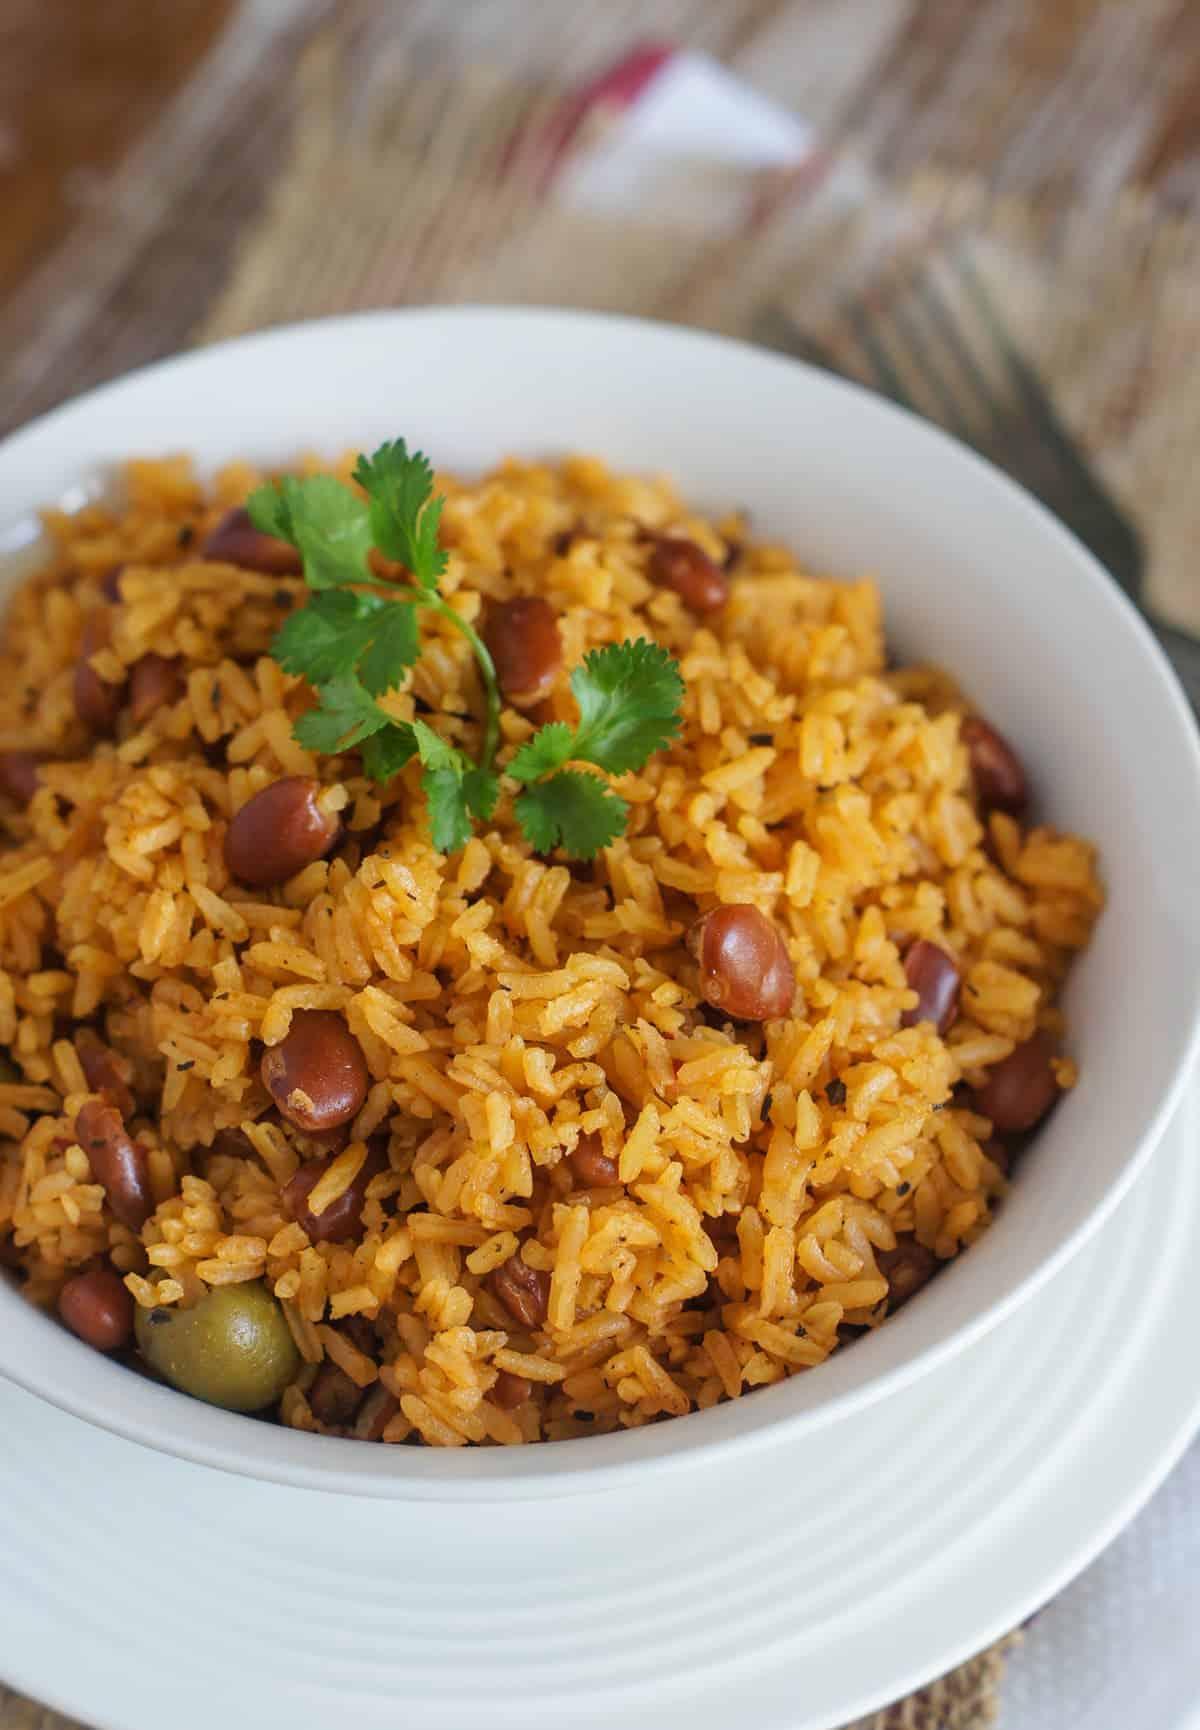 Moro de Habichuelas hispanic heritage month makes perfect meal